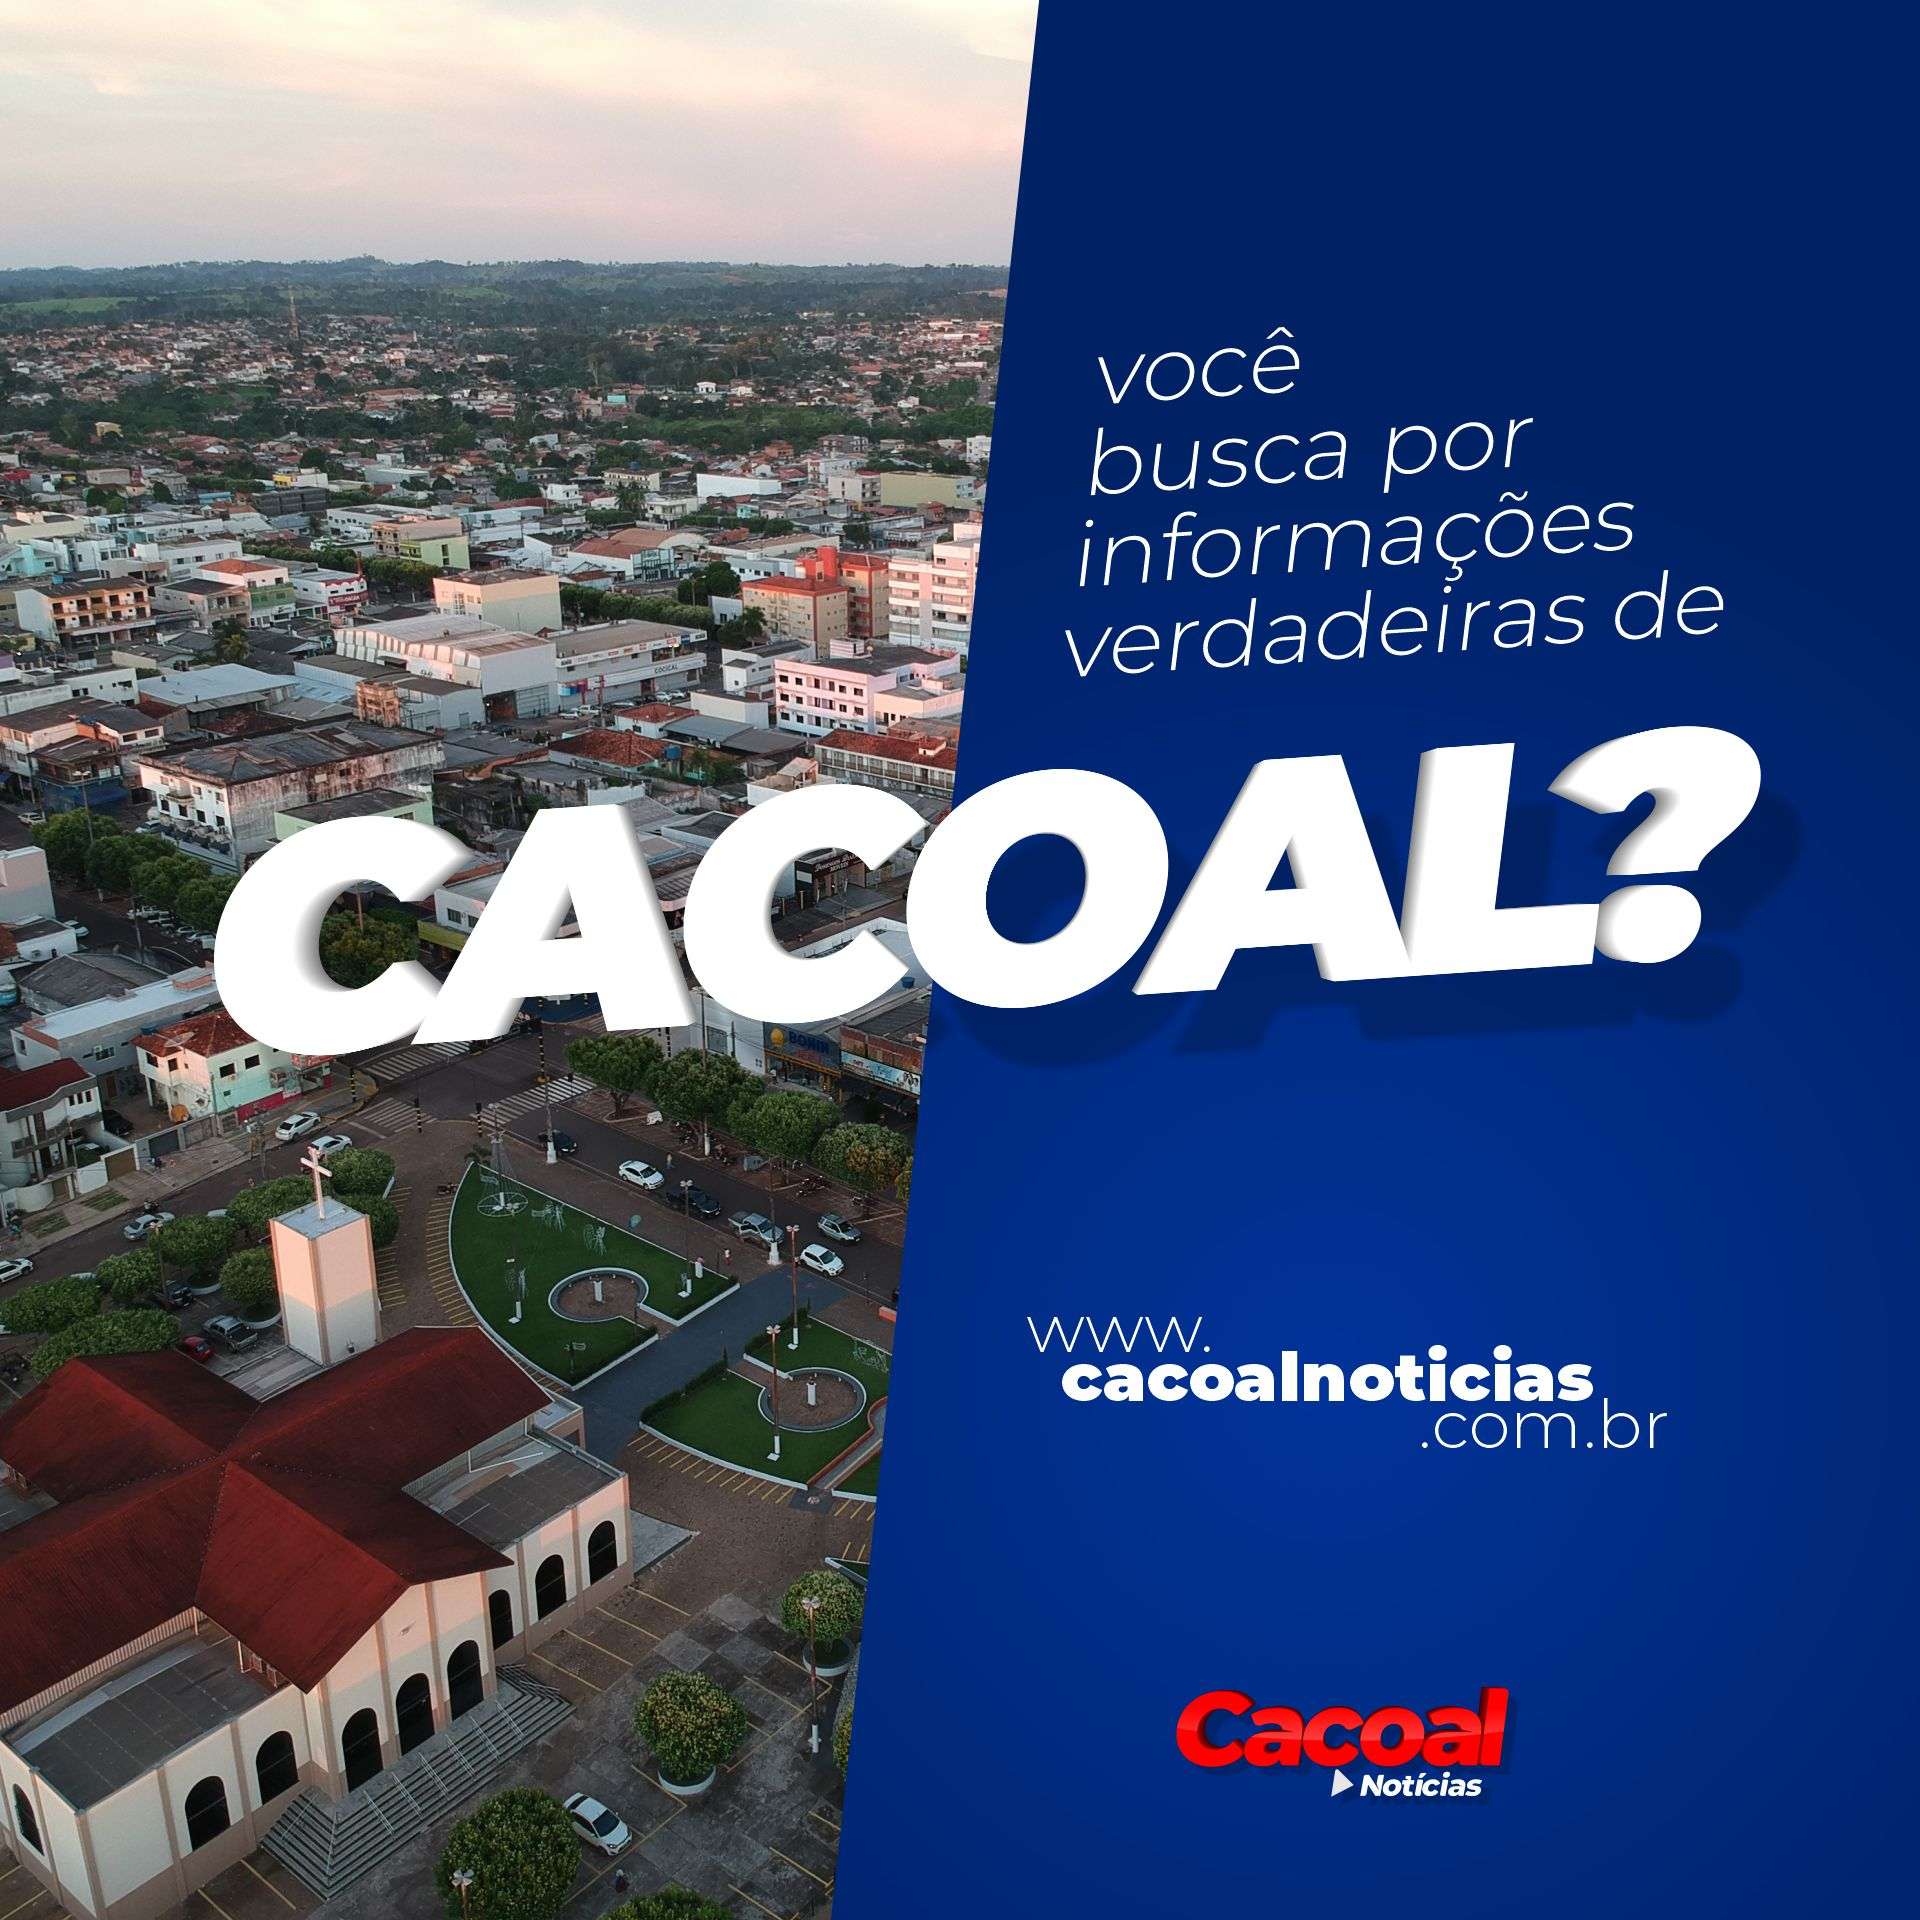 LOGO CACOAL NOTICIAS